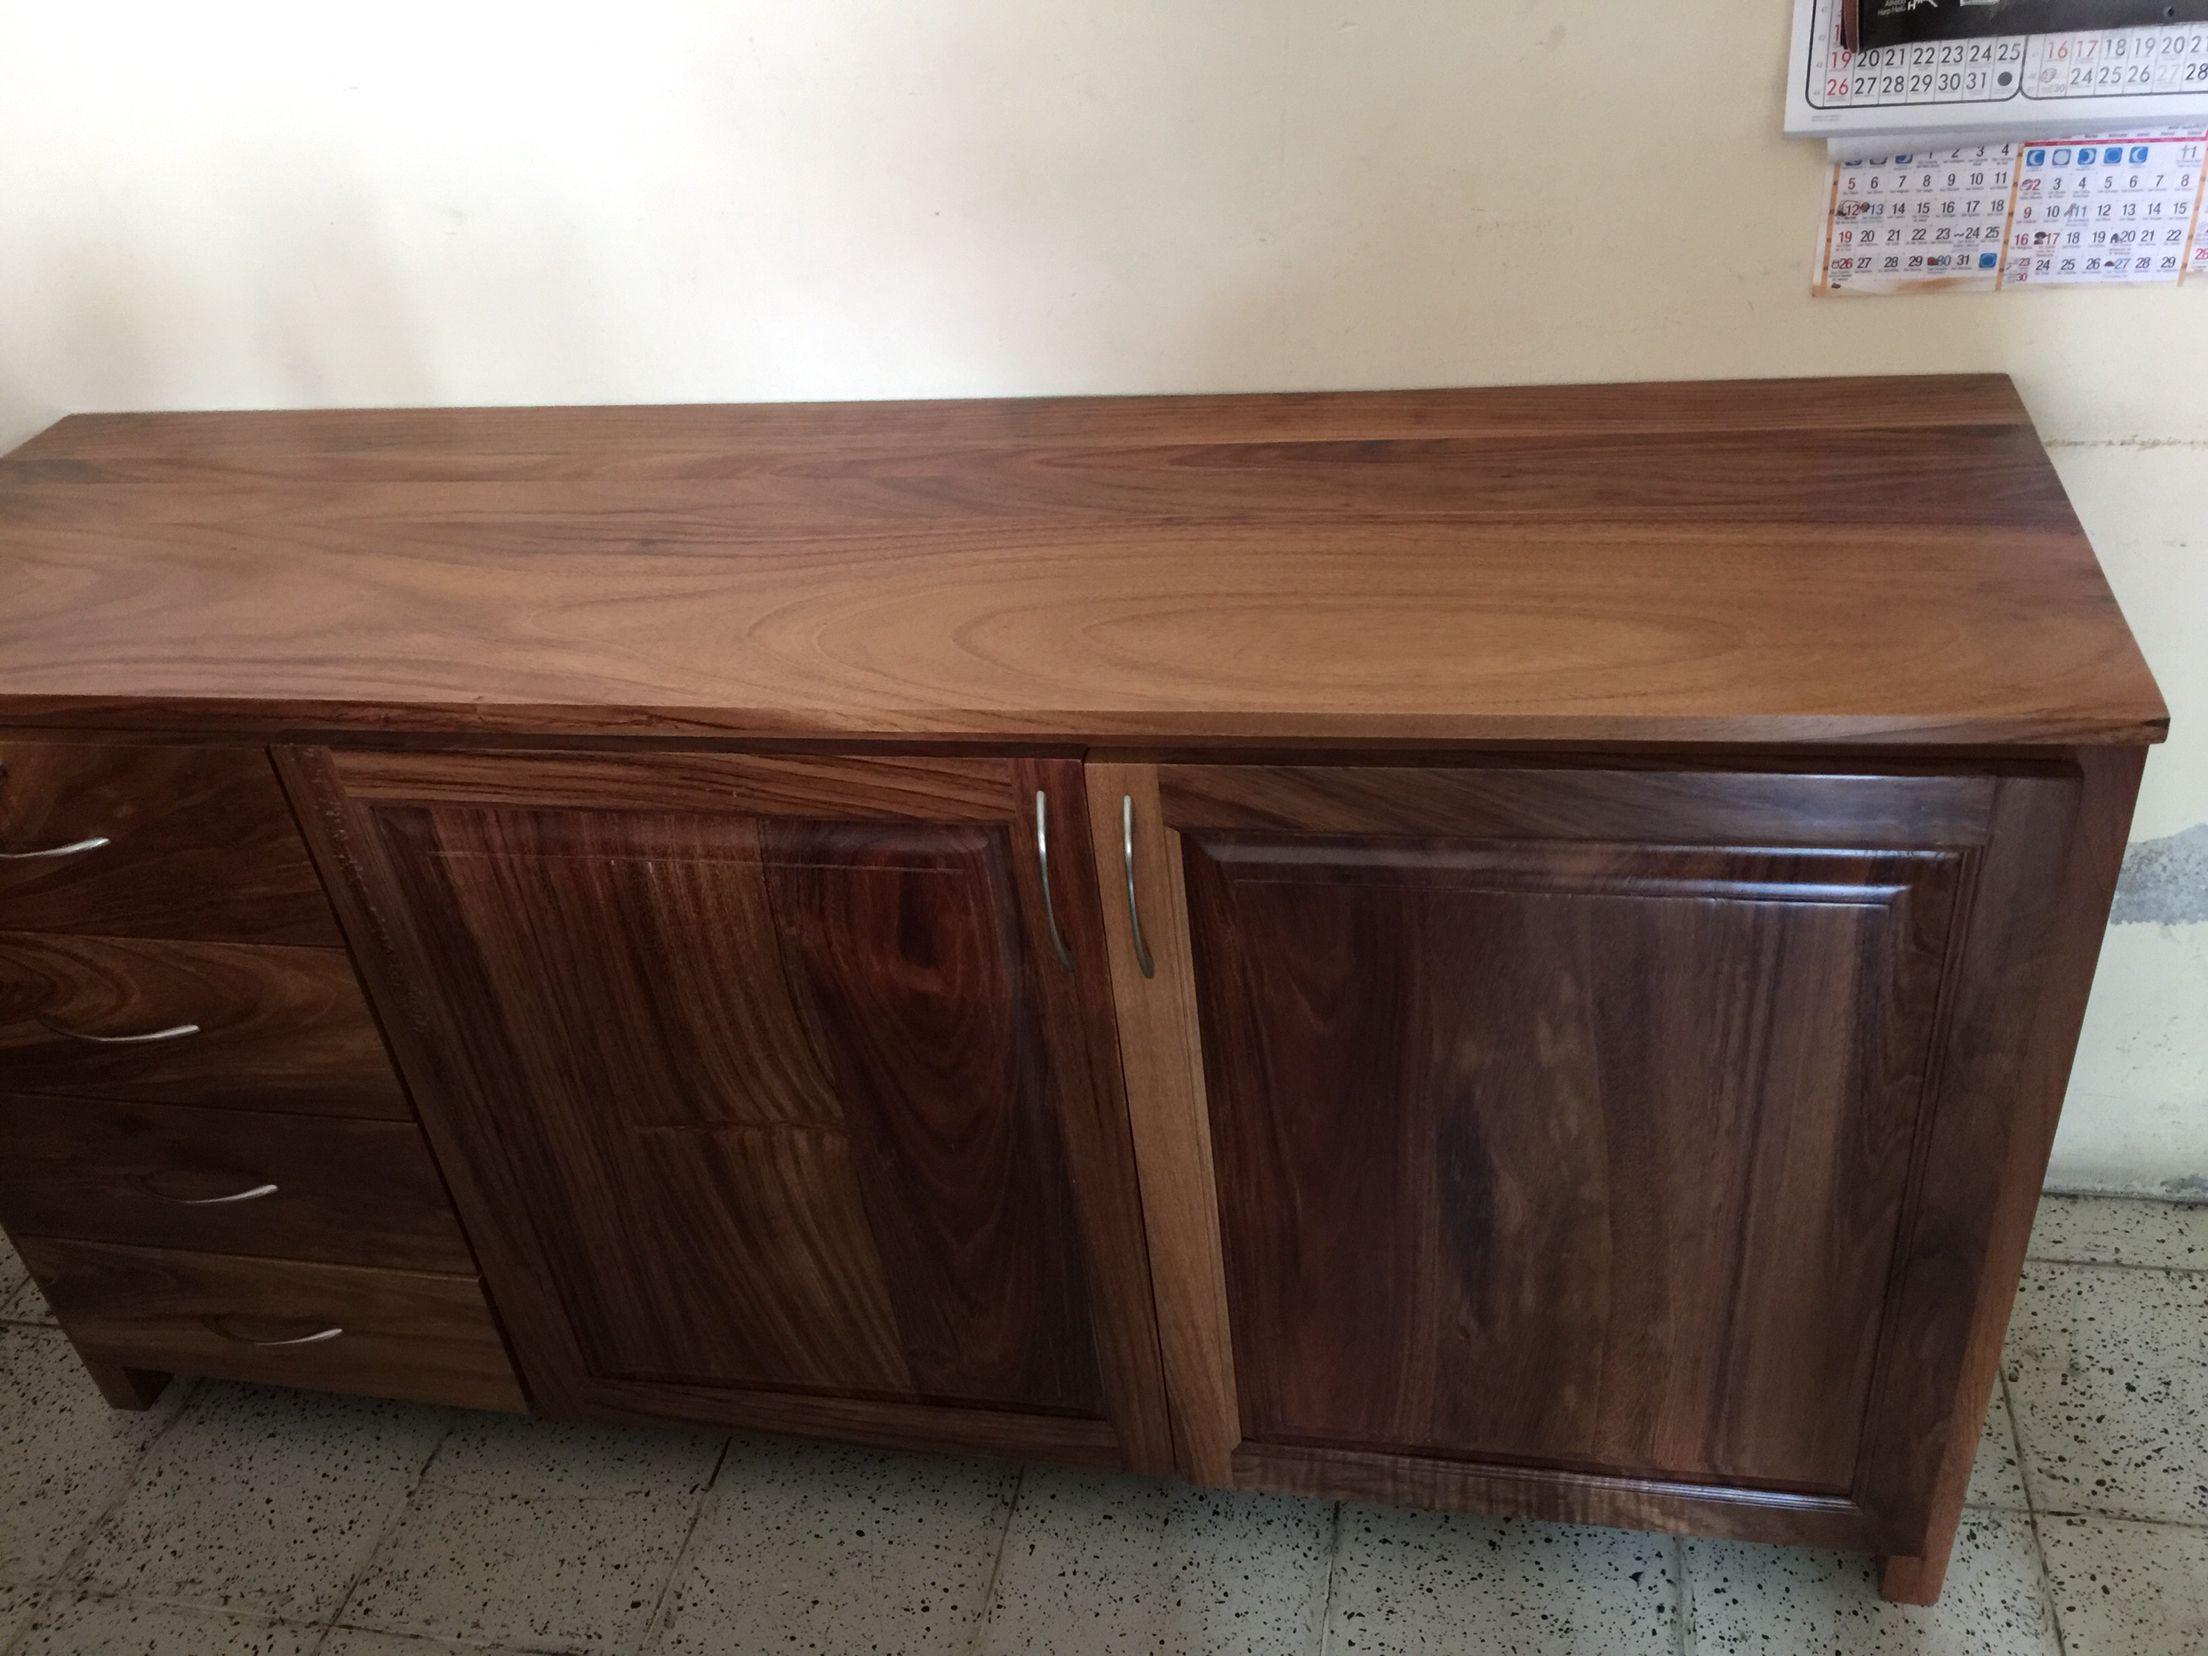 Mueble en madera de parota | Puertas Langarica | Pinterest ...